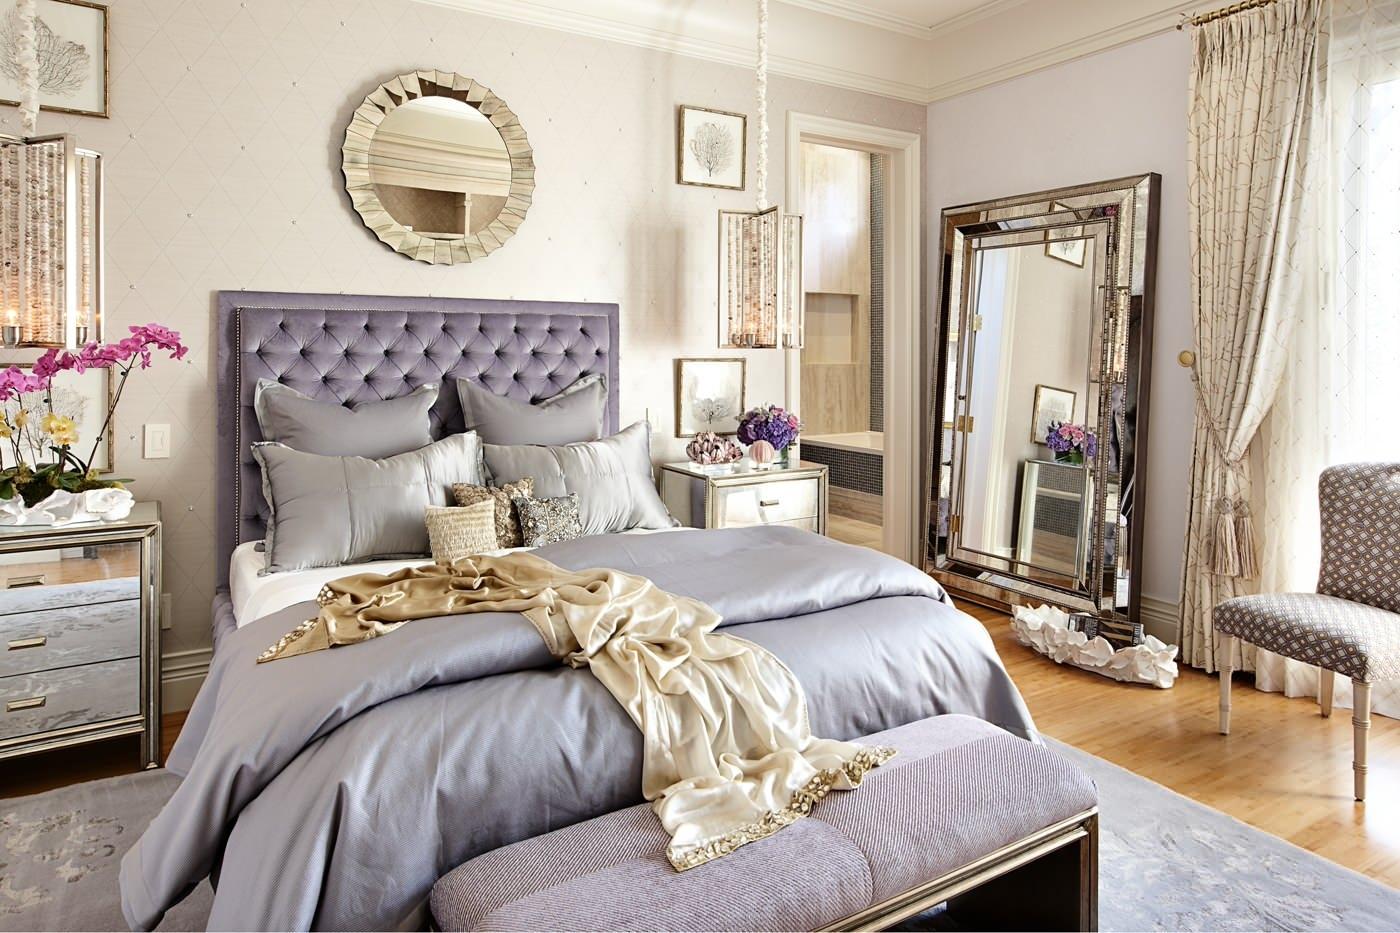 Young Adult Men Bedroom Ideas — Randolph Indoor and Outdoor ...